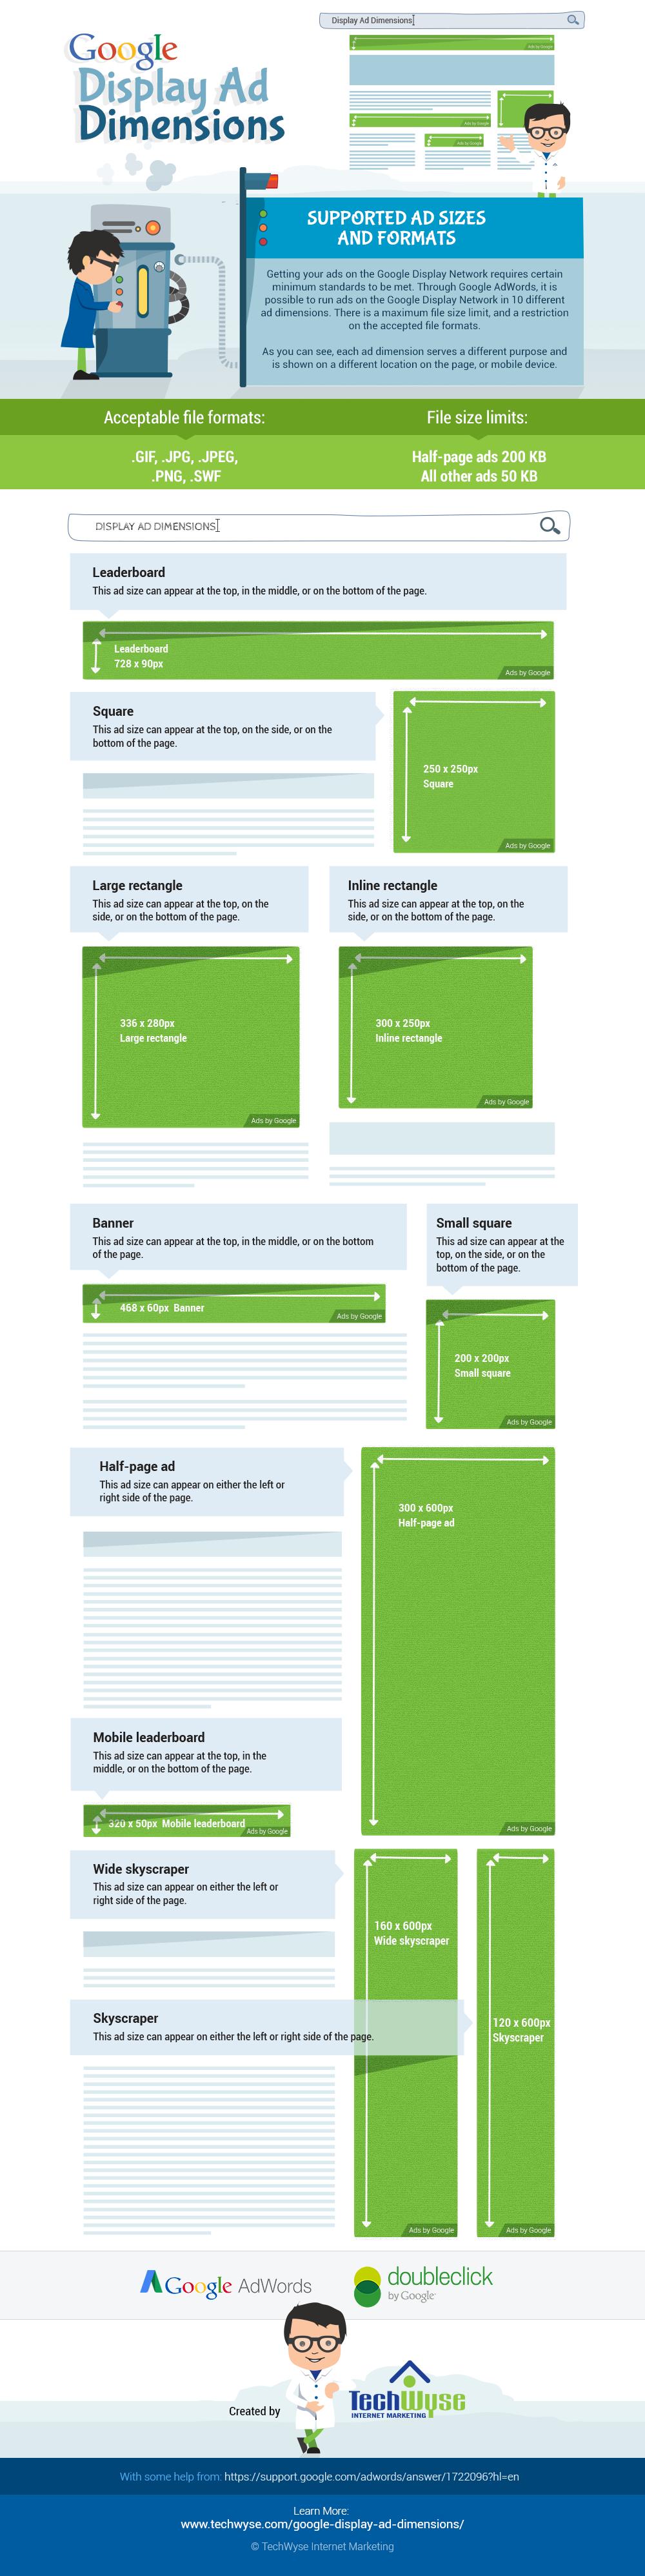 Google Display Ad Dimensions 2014   #infographic #Advertising #GoogleAdword